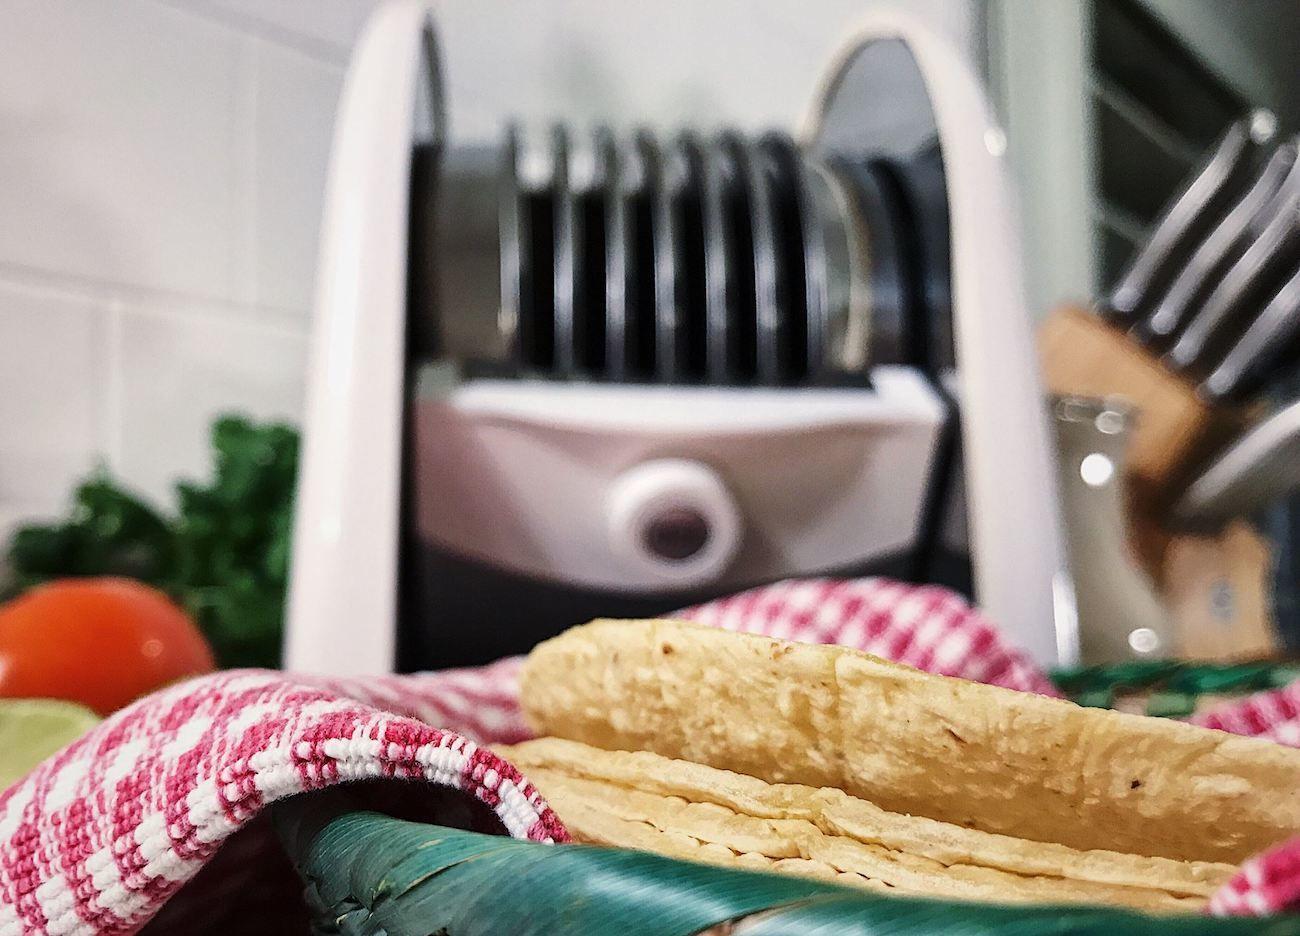 Nuni 6-Slot Tortilla Toaster